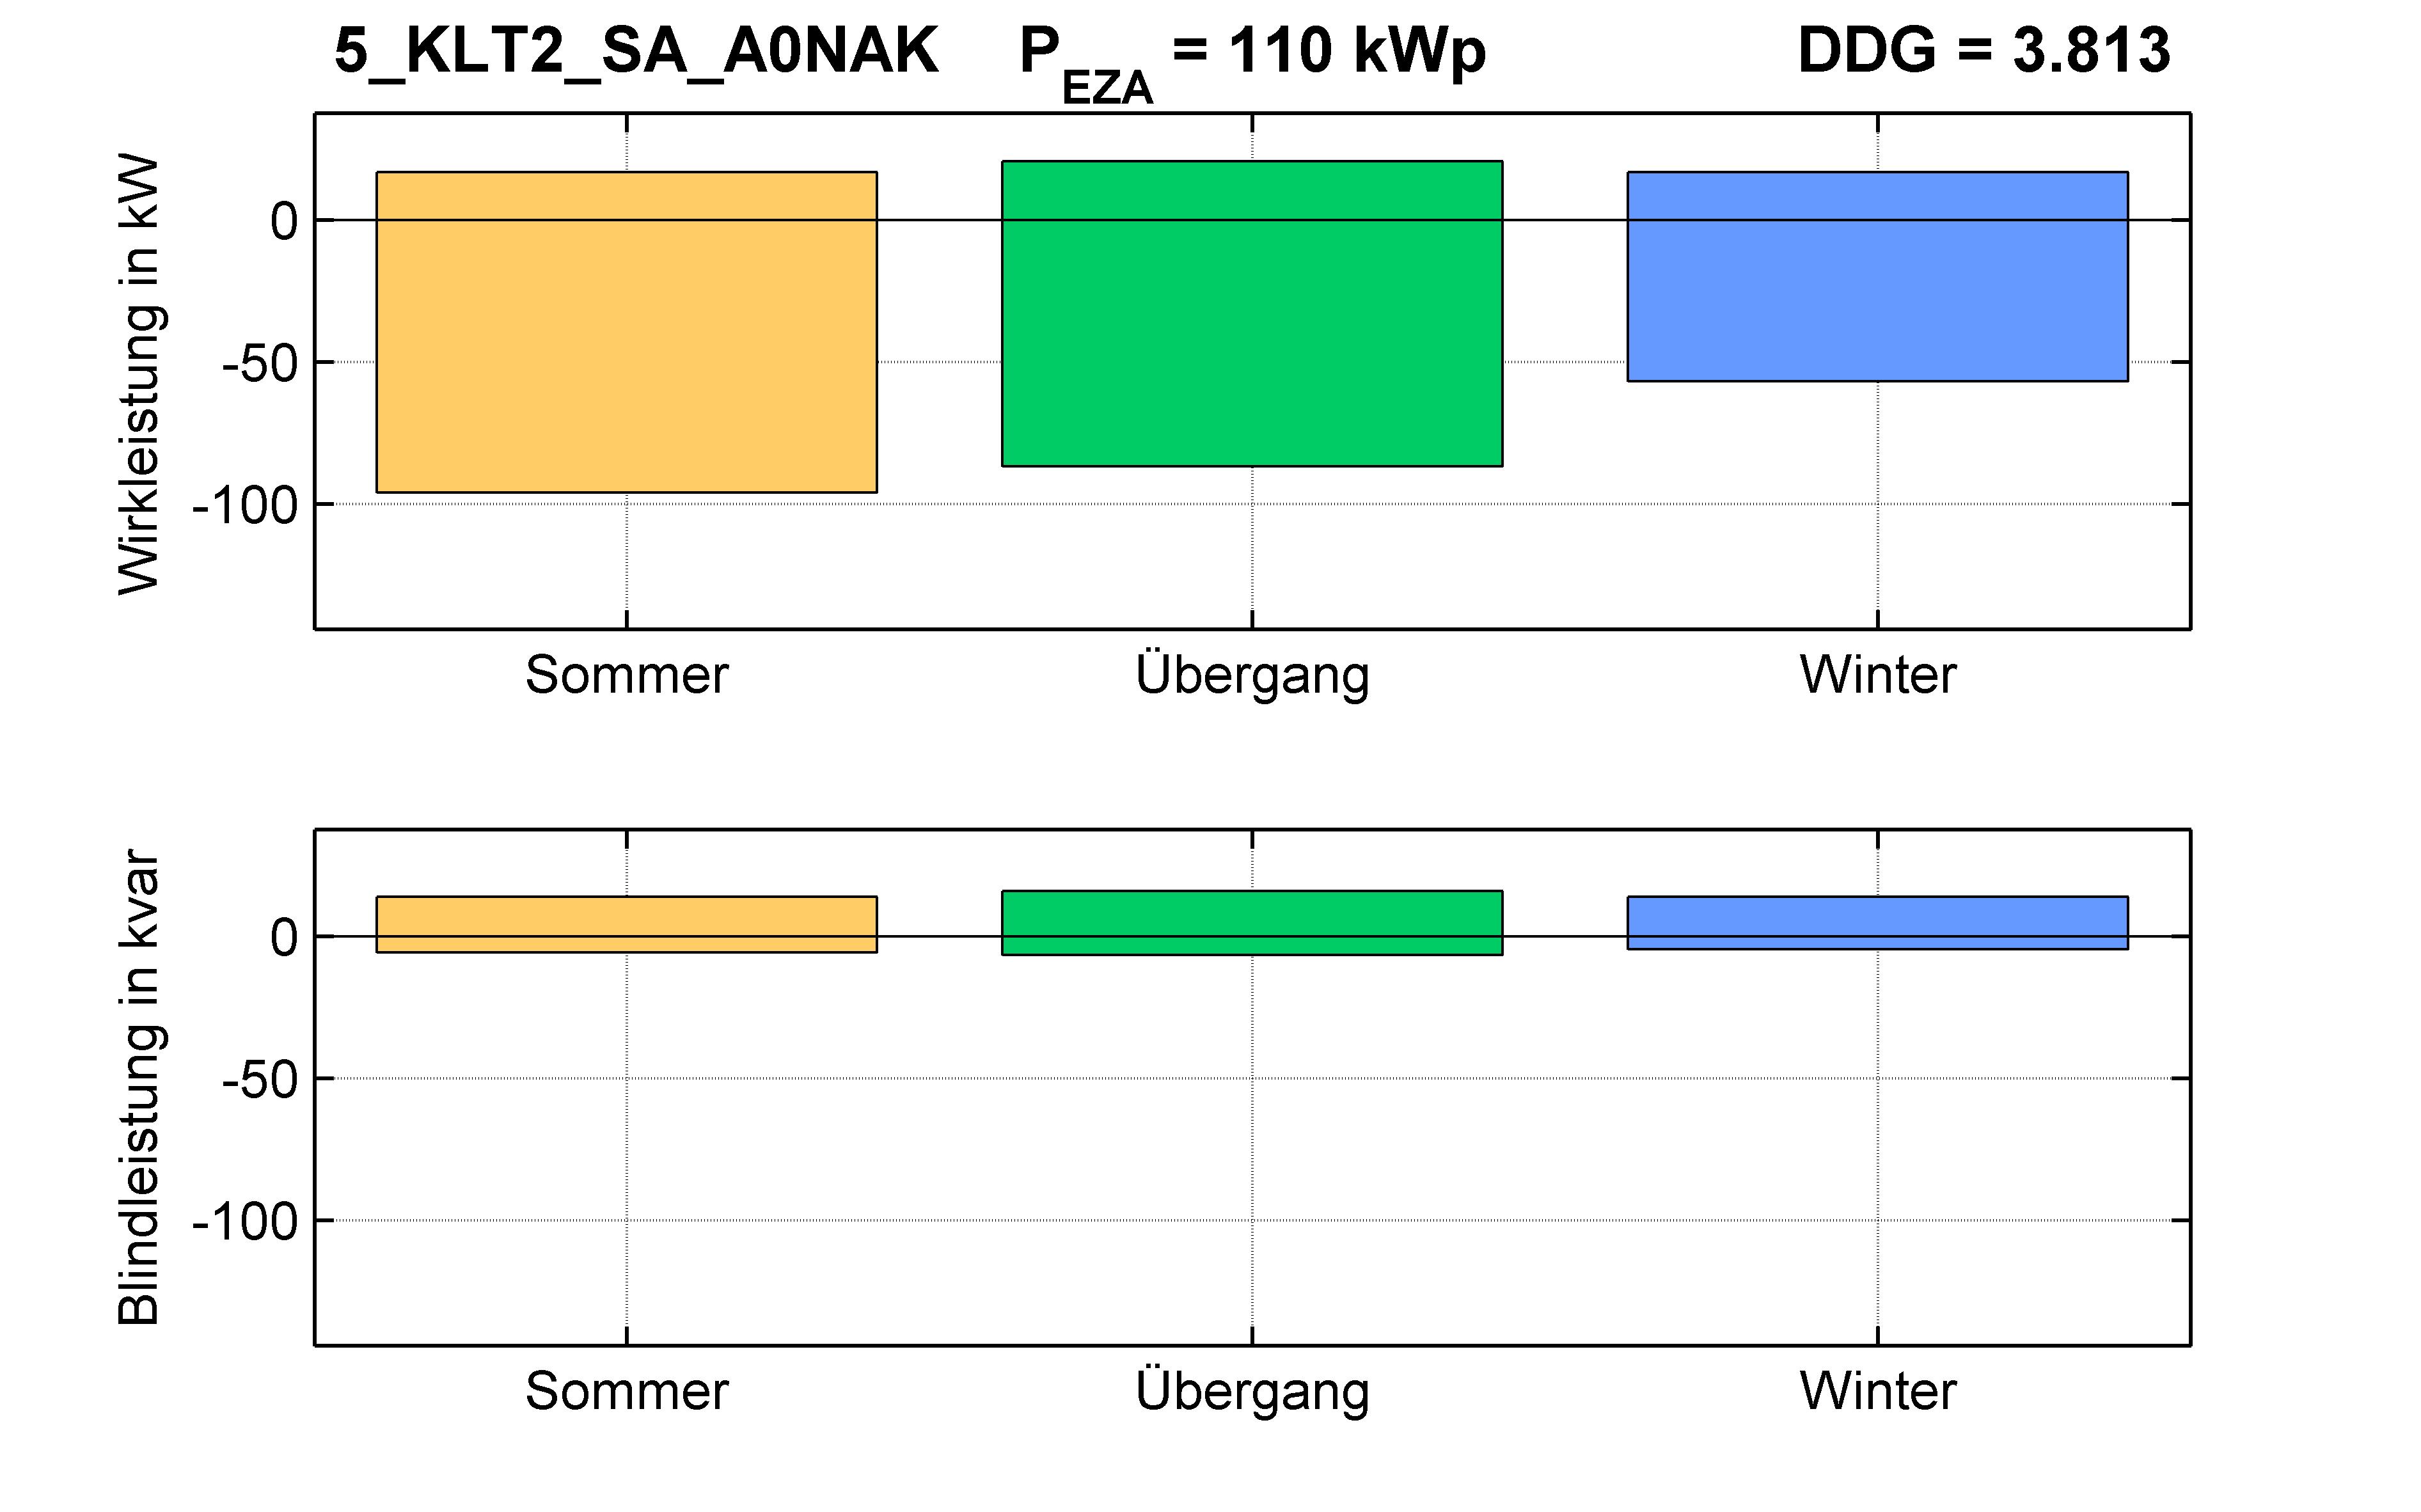 KLT2 | STATION (SA) A0NAK | PQ-Bilanz